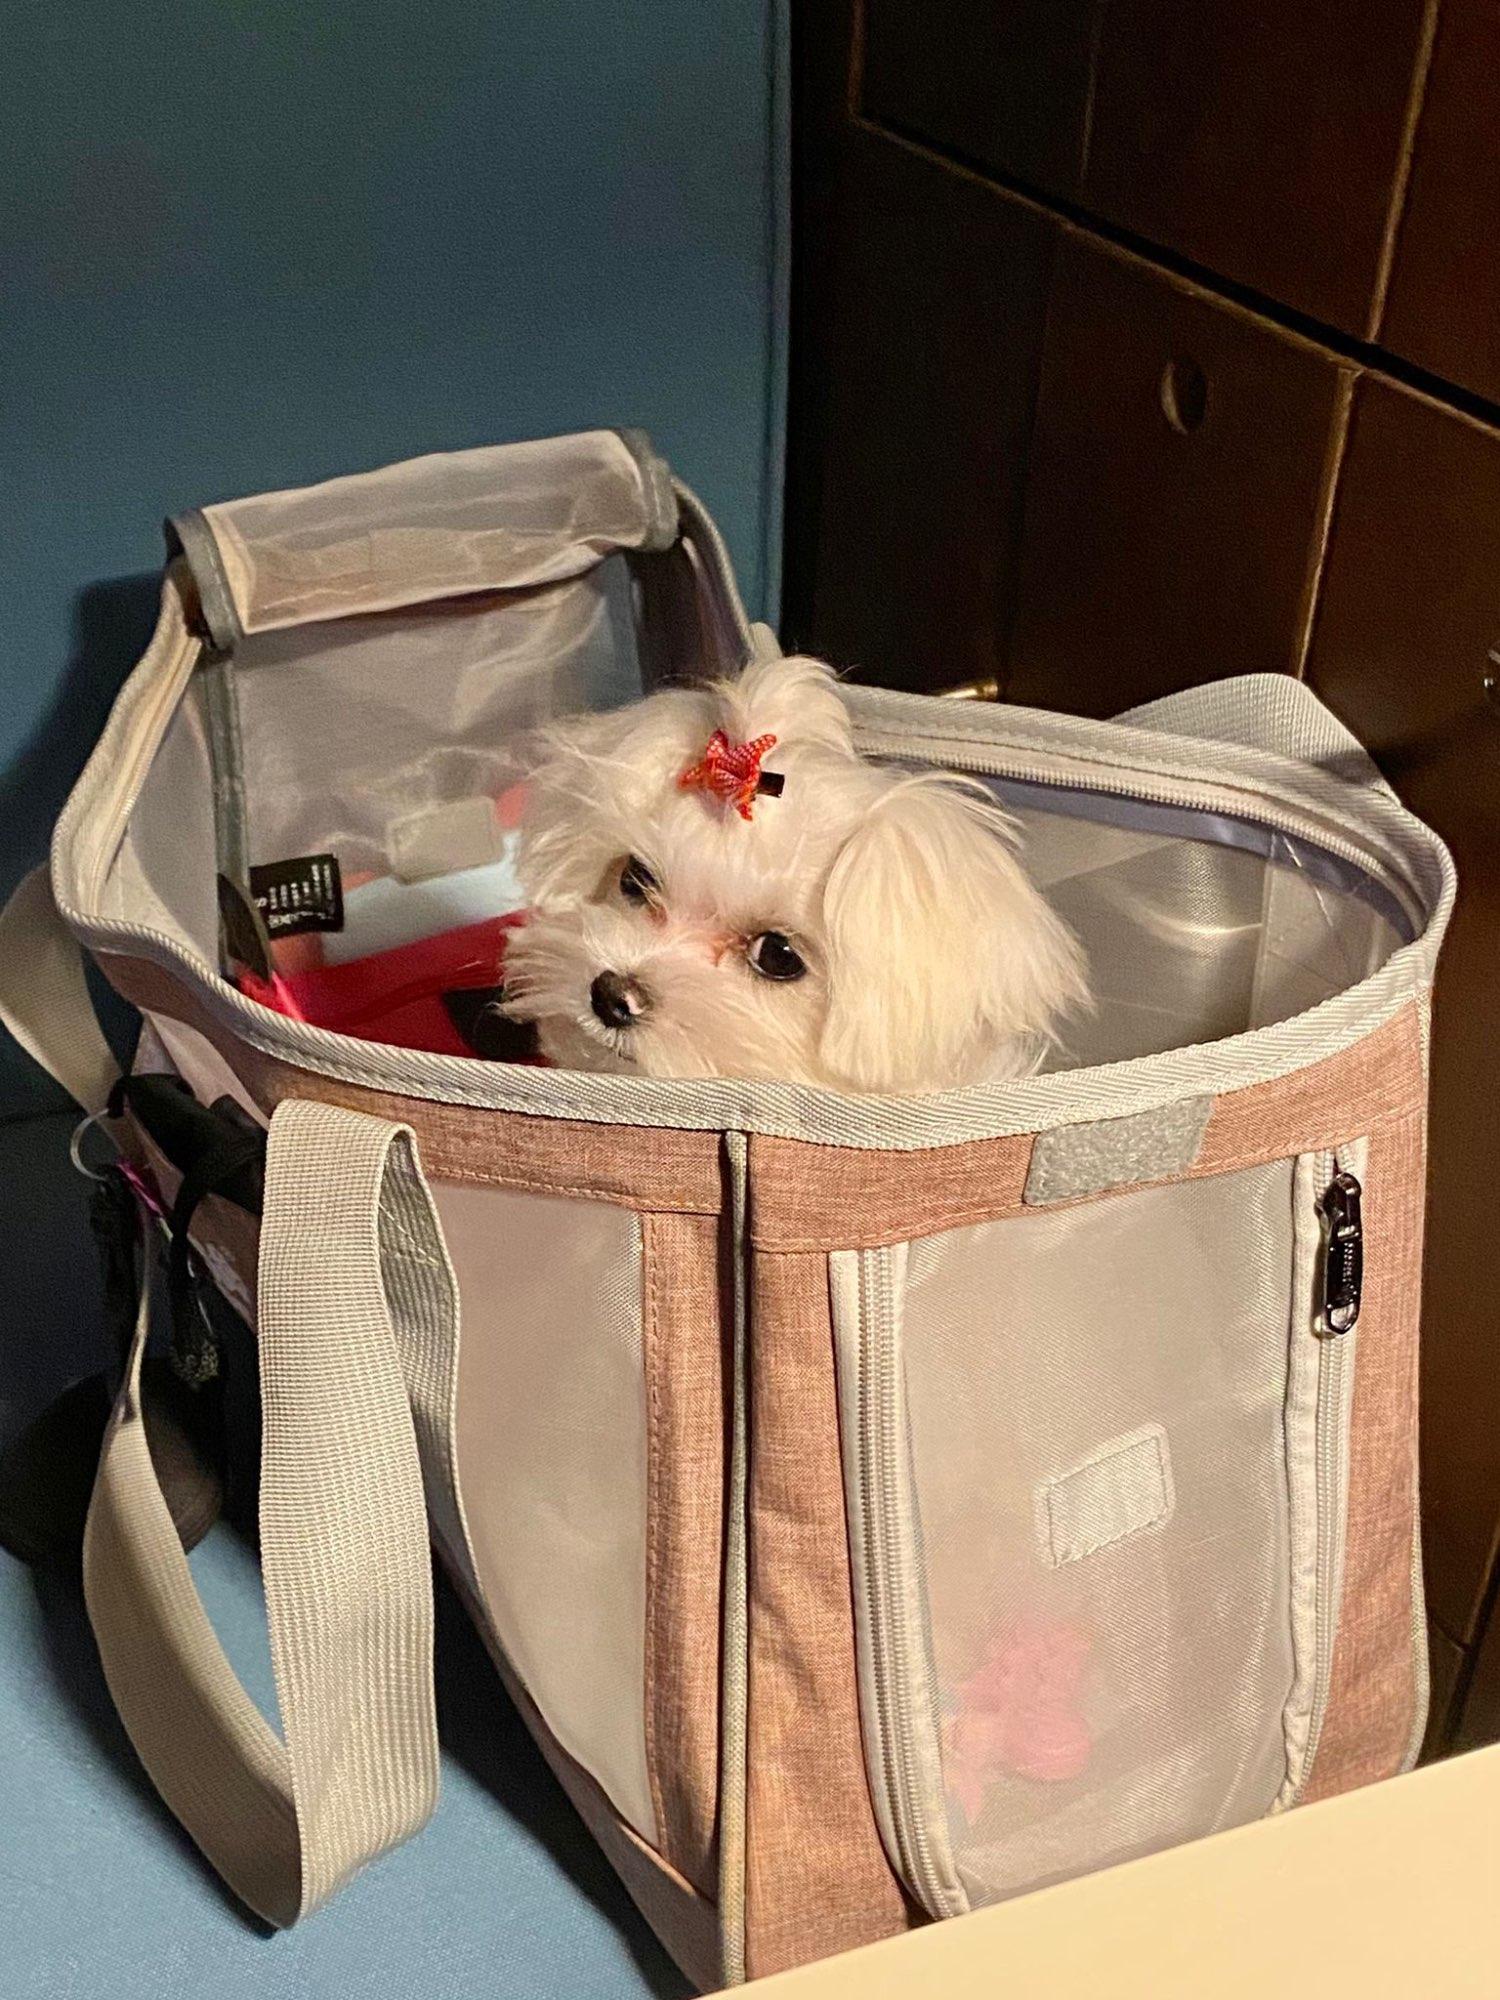 DogMEGA Dog Tote Bag   Small Dog Tote Bag   Dog Travel Tote photo review